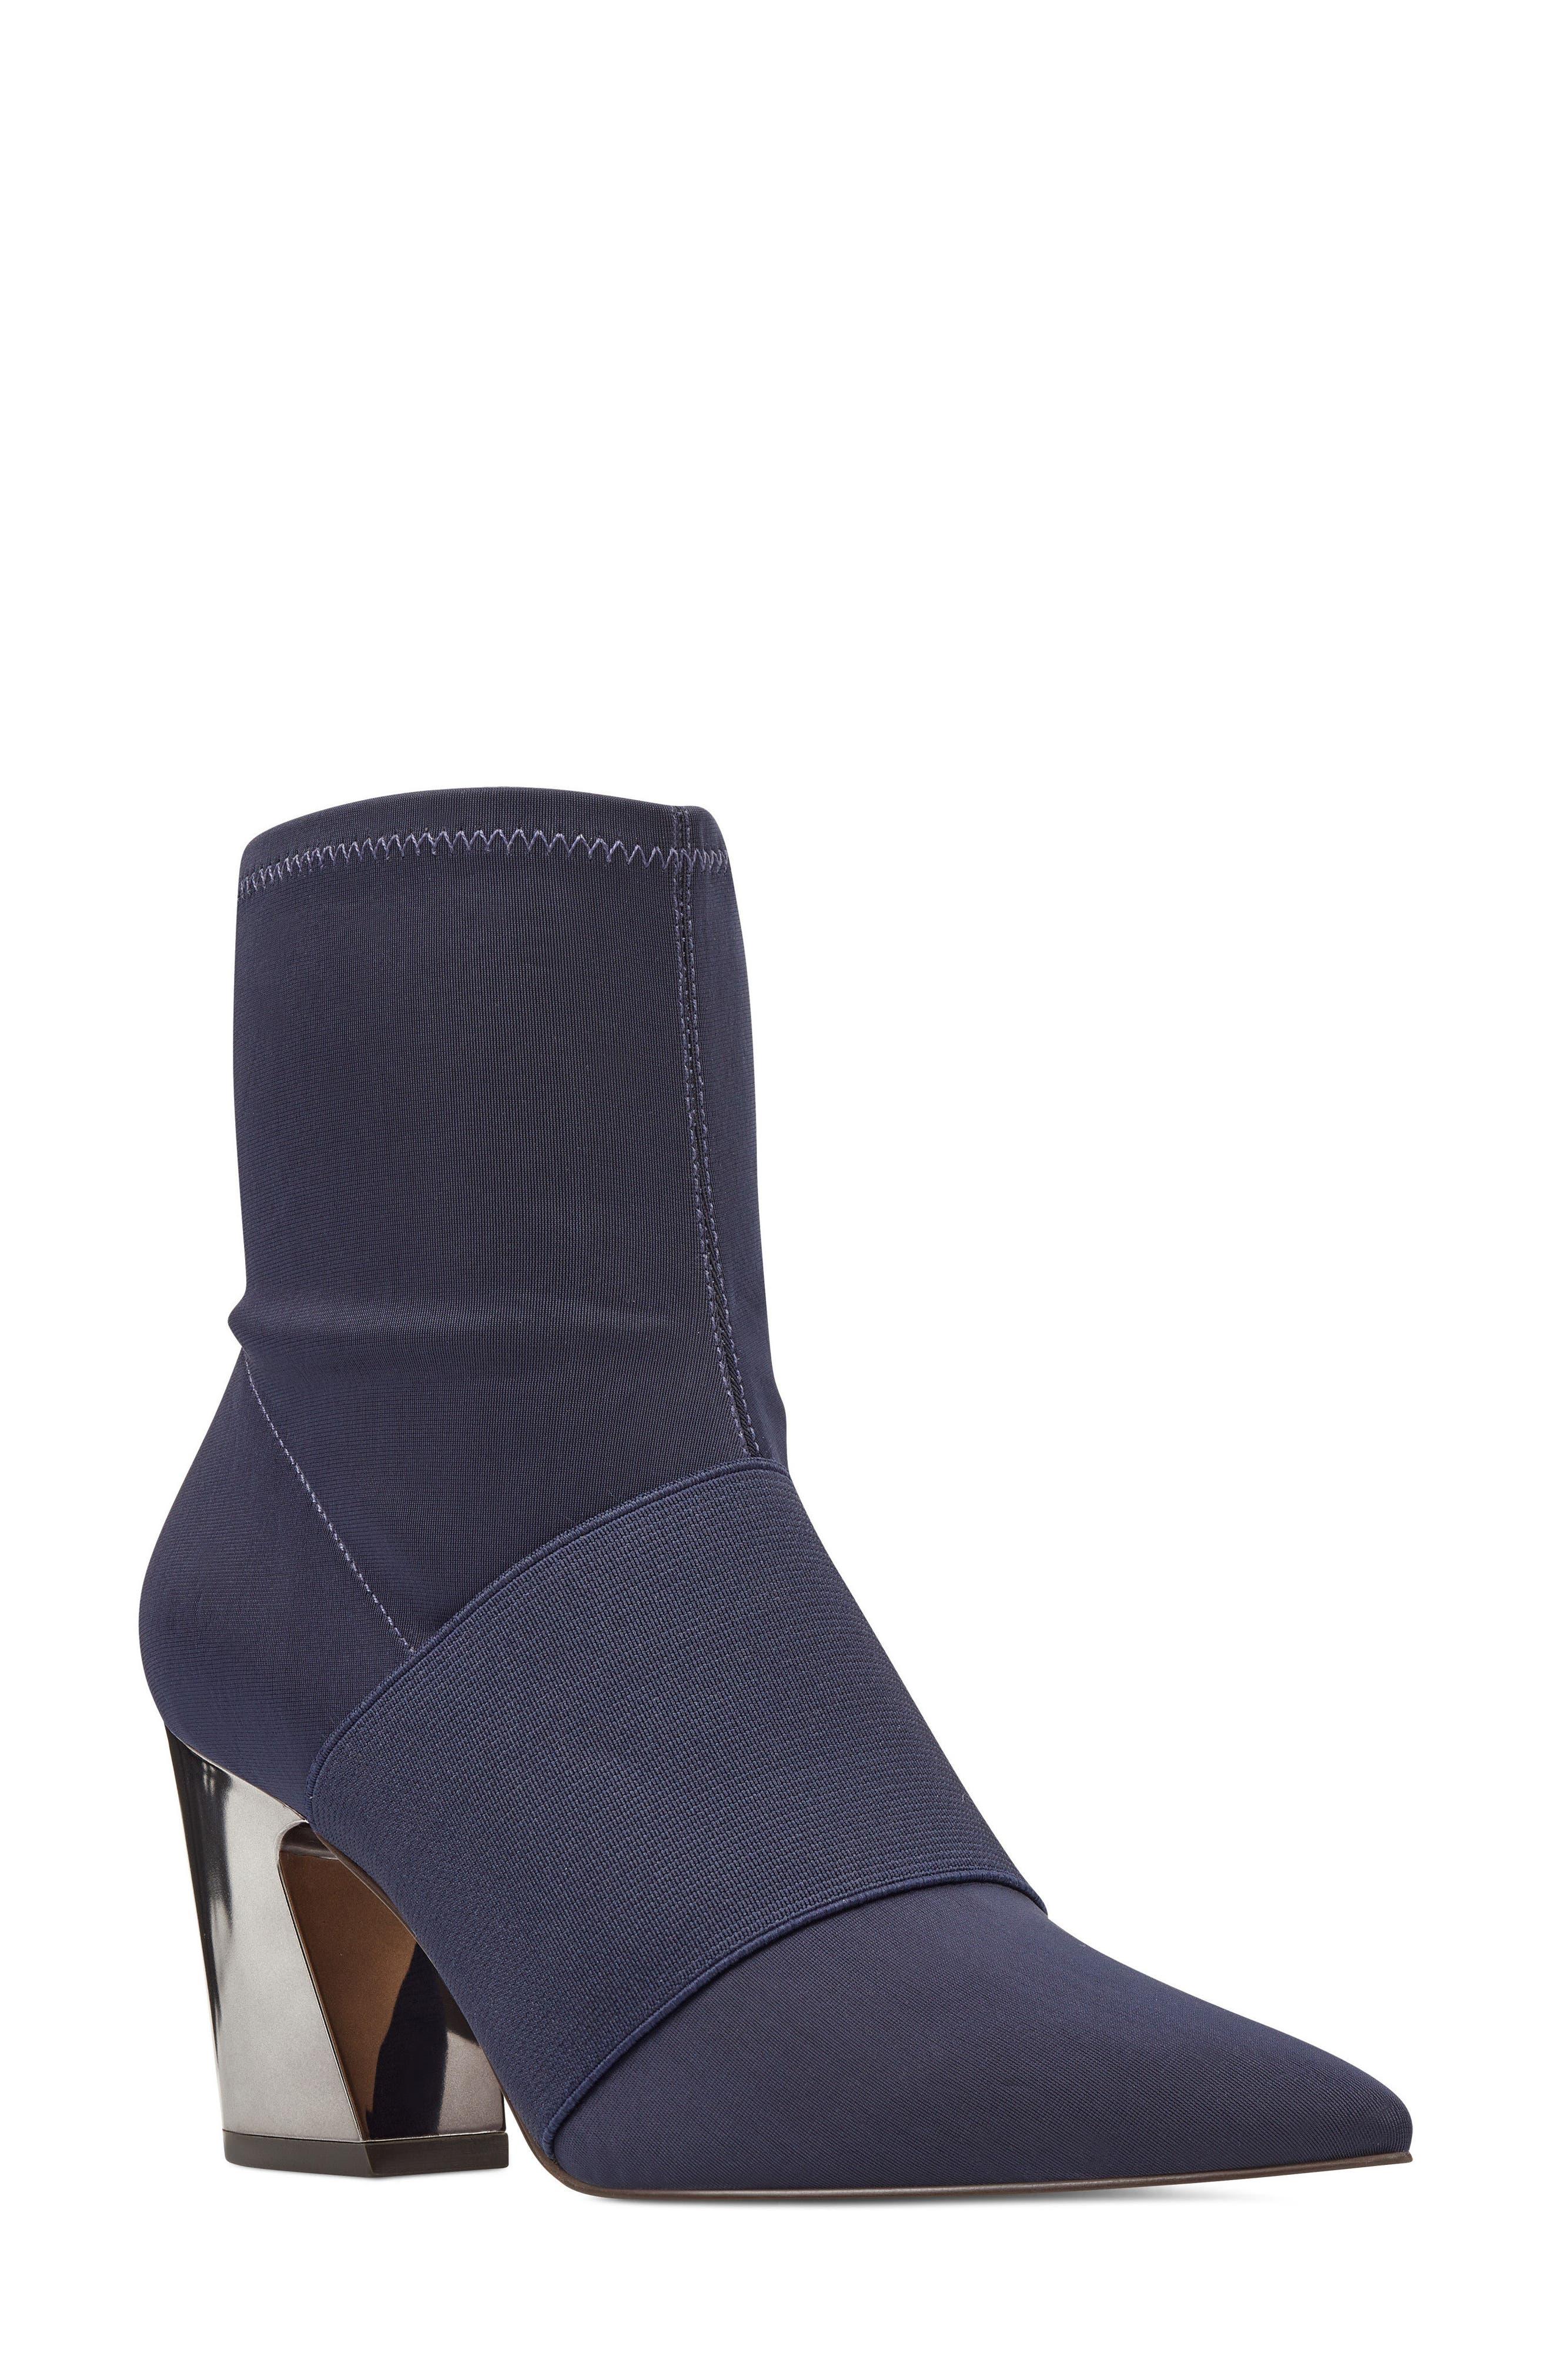 74d18cf1ea2 nine west boots